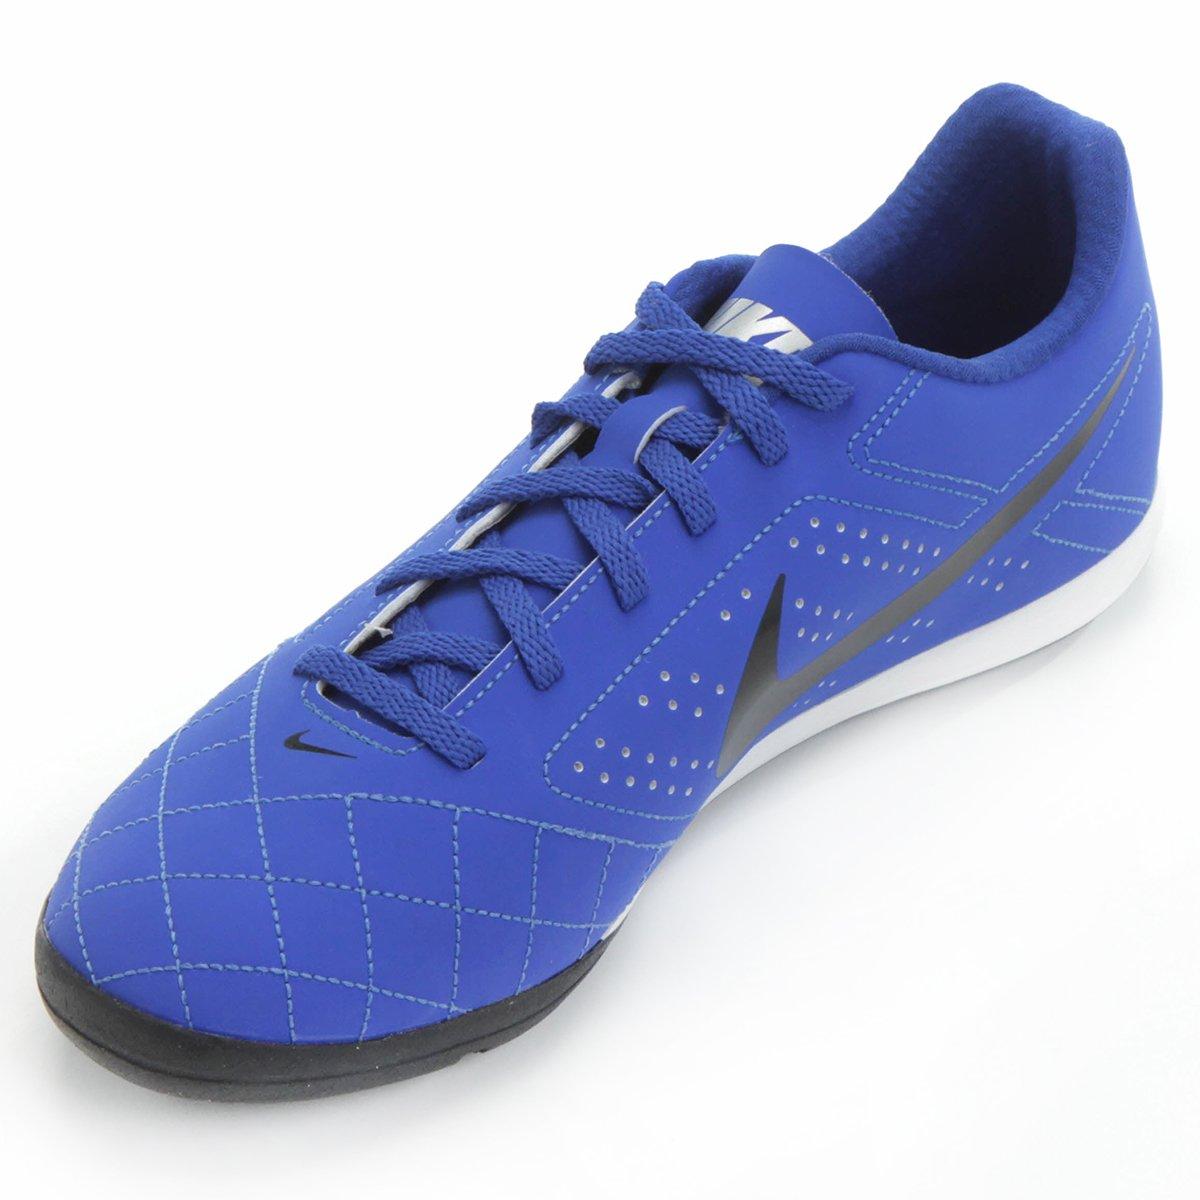 488b2e2d60 Chuteira Futsal Nike Beco 2 Futsal - Azul Royal - Compre Agora ...